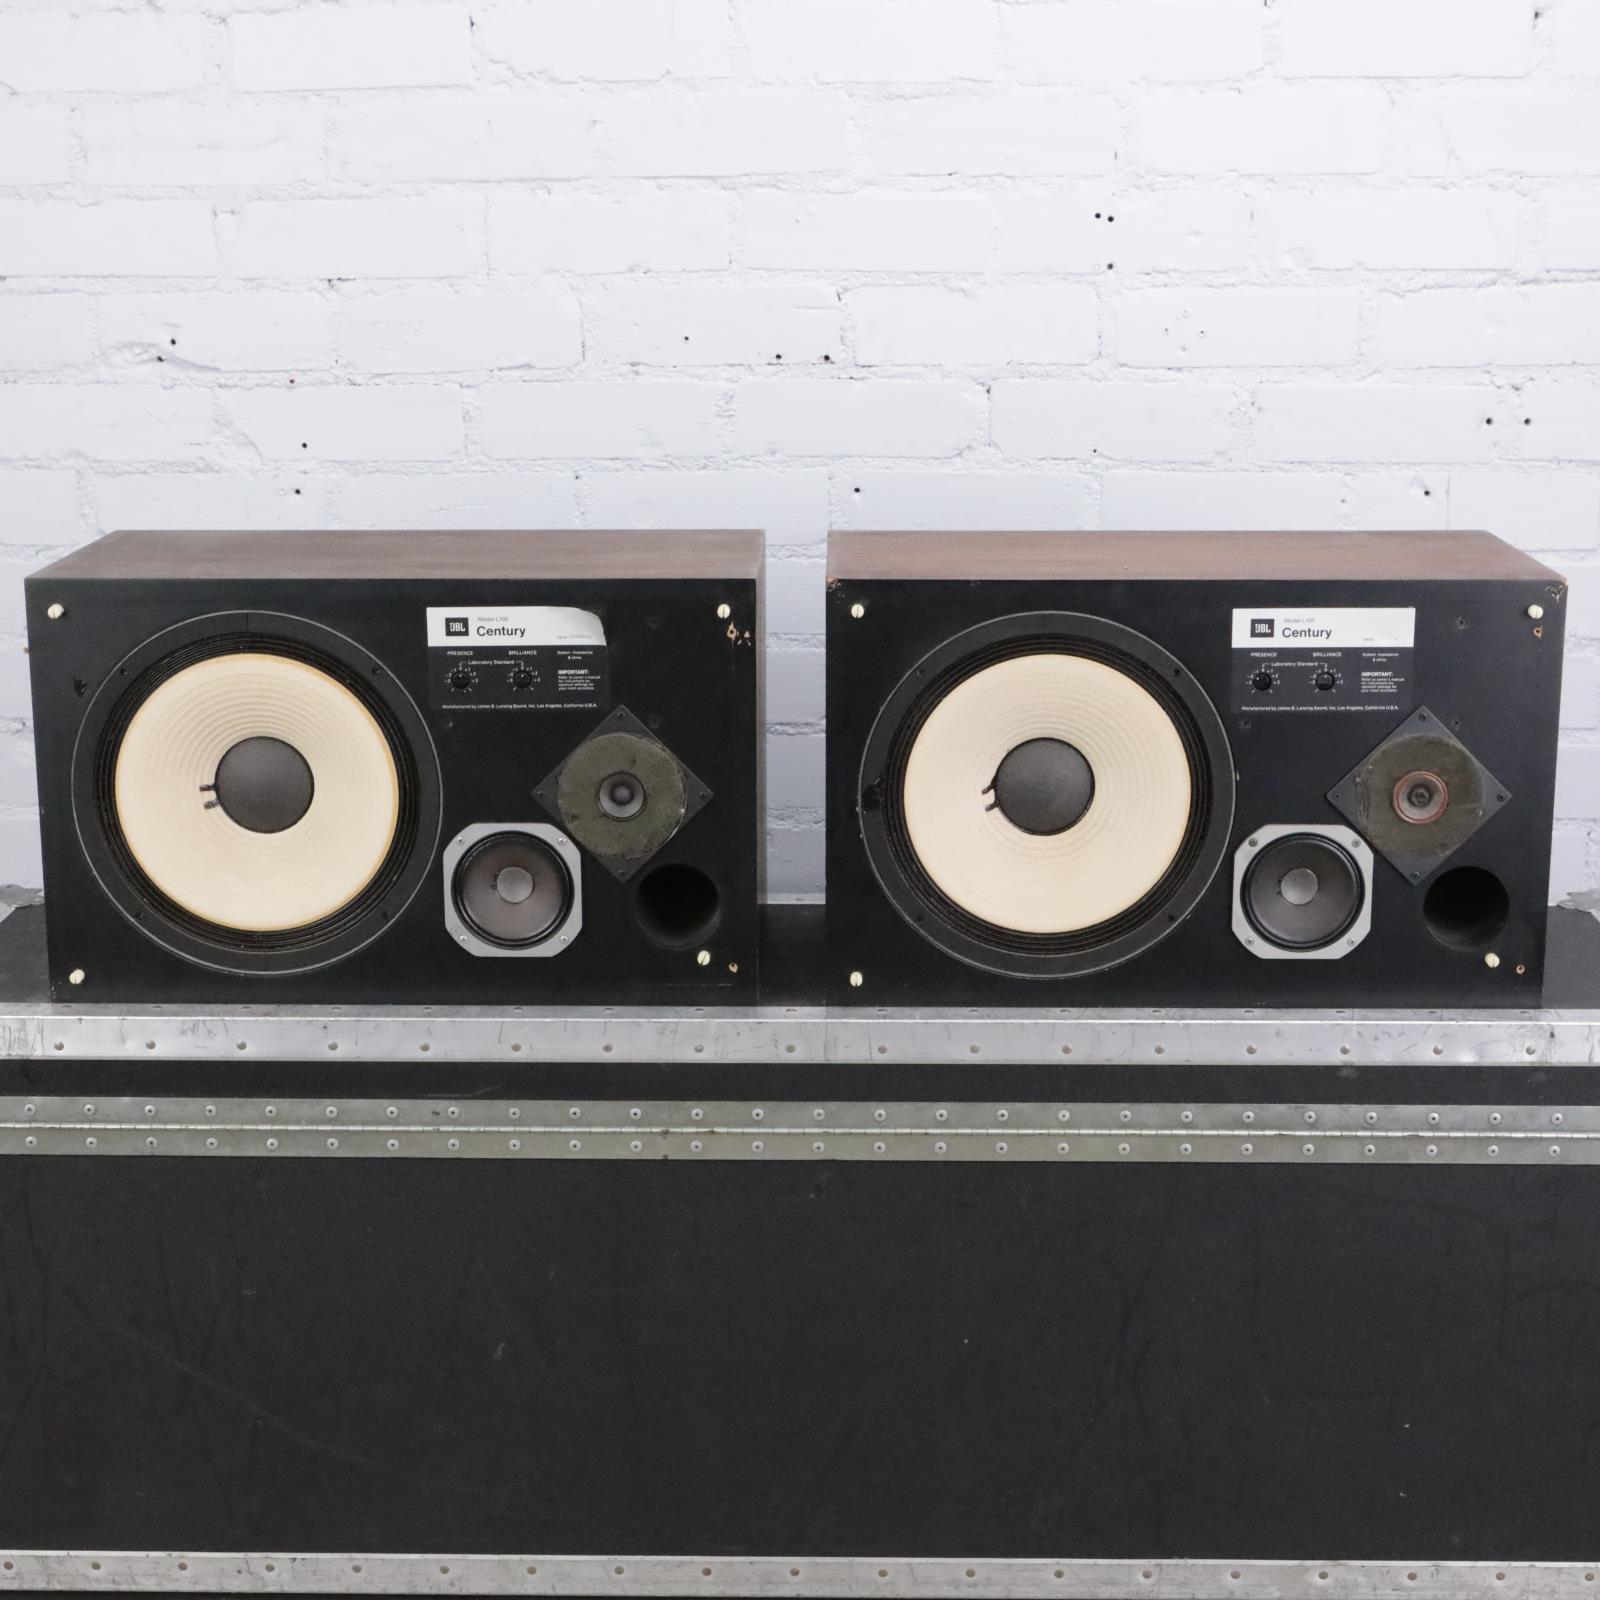 JBL Century Model L100 Studio Monitor Speakers #42290